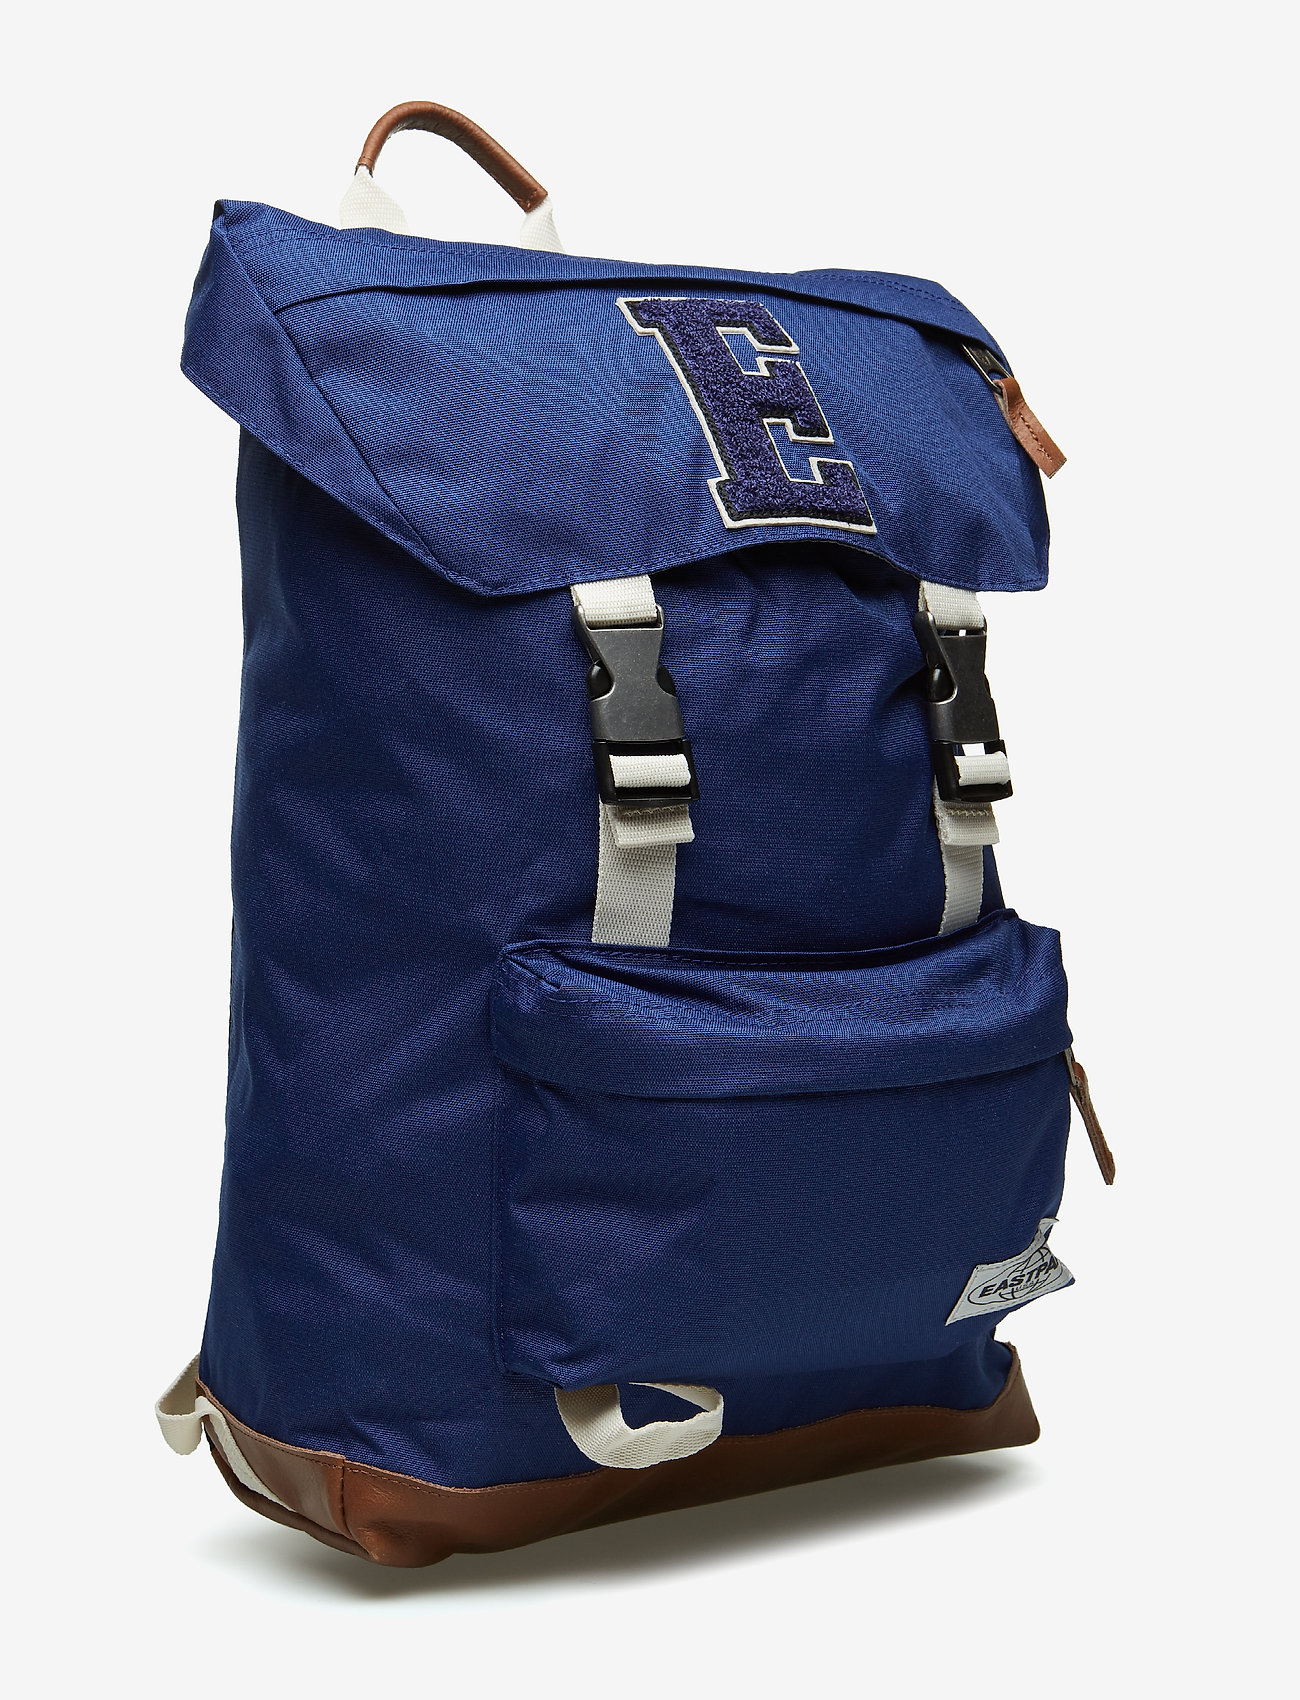 Eastpak - ROWLO - rucksäcke - into e - 1